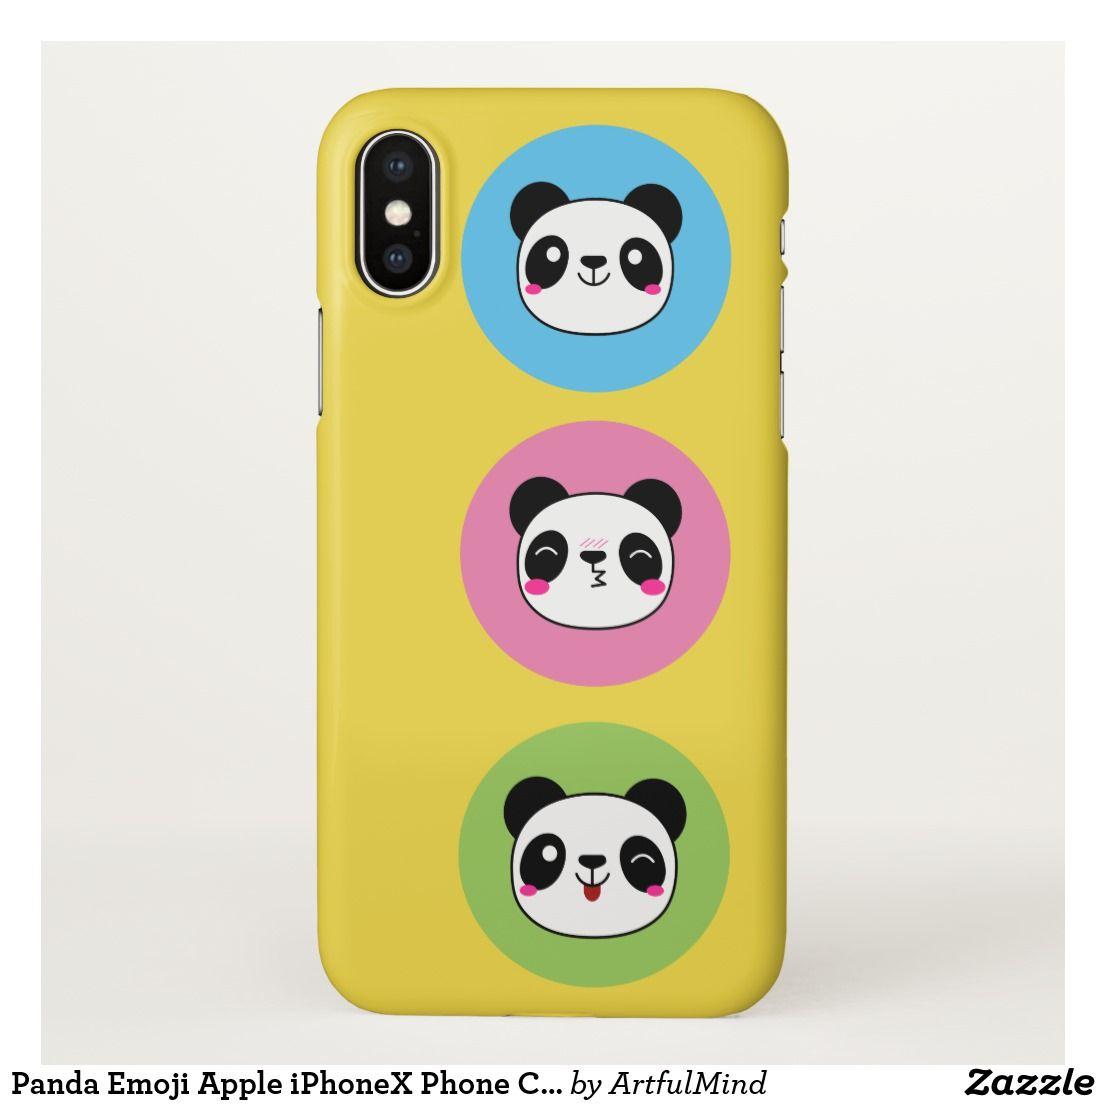 Panda Emoji Apple iPhoneX Phone Case Iphone